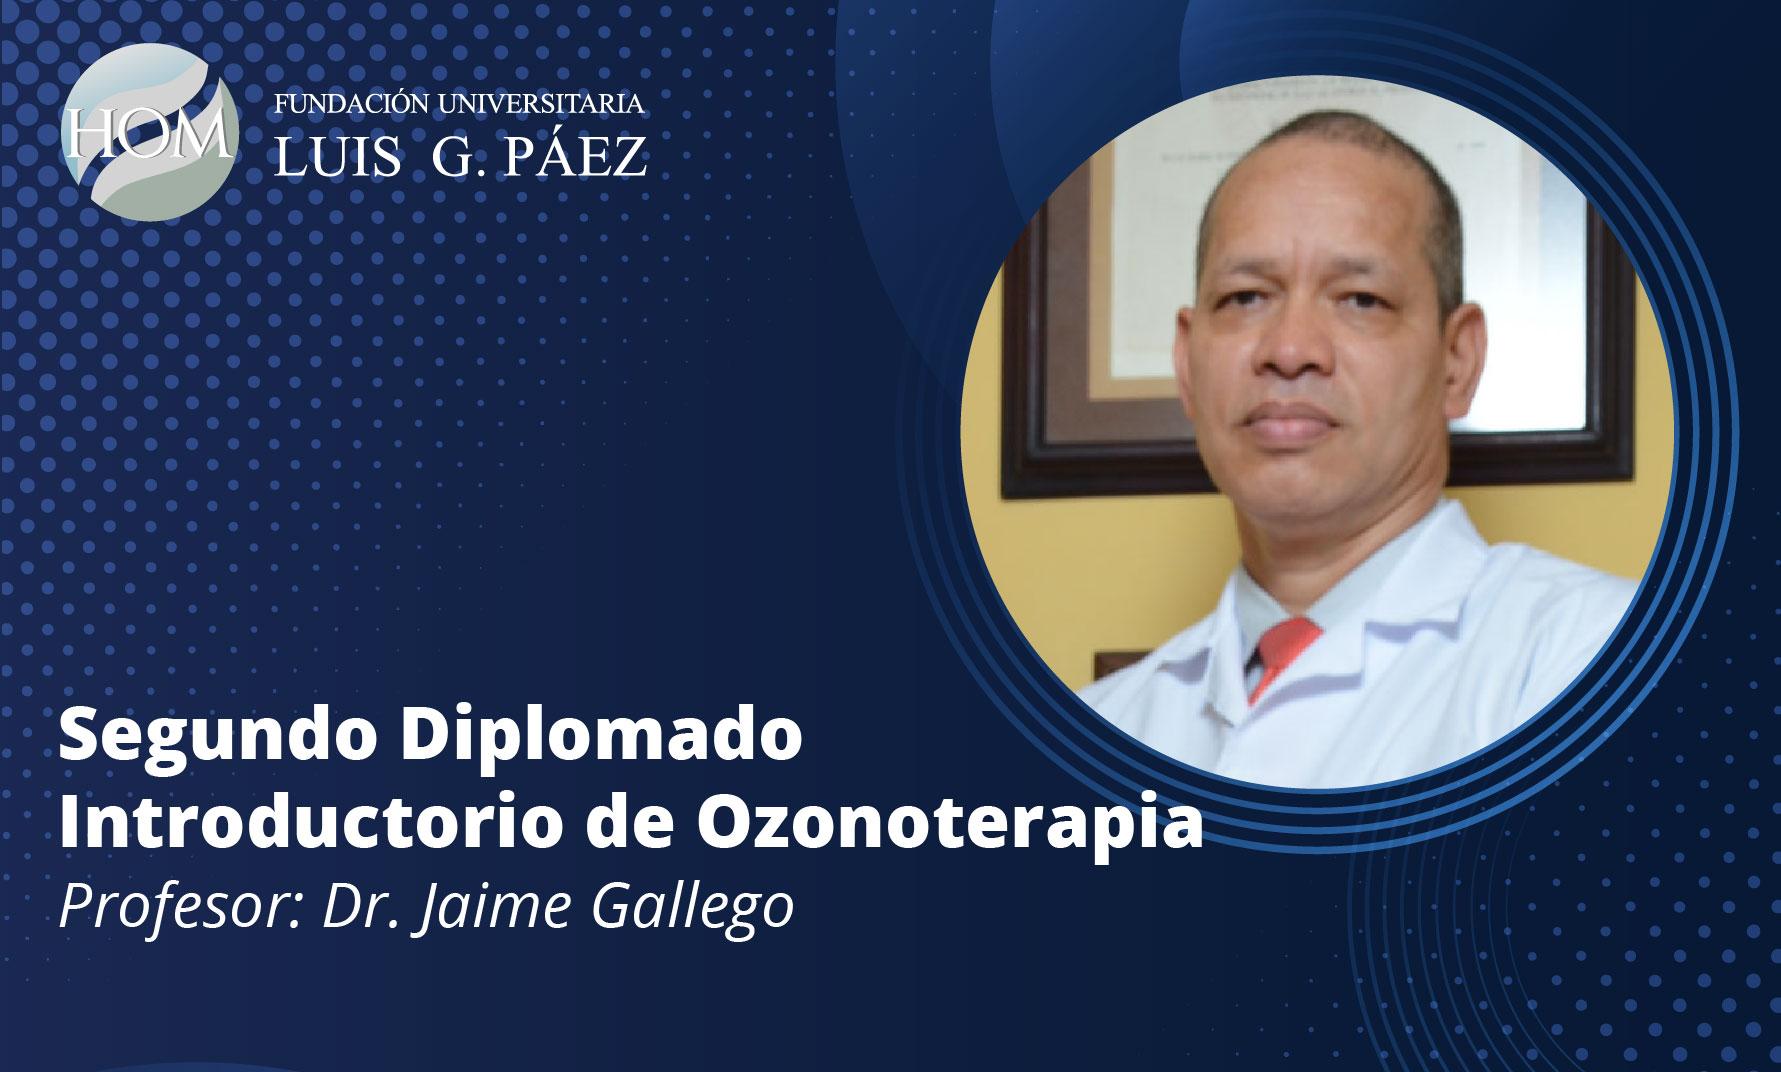 Segundo diplomado Introductorio de Ozonoterapia